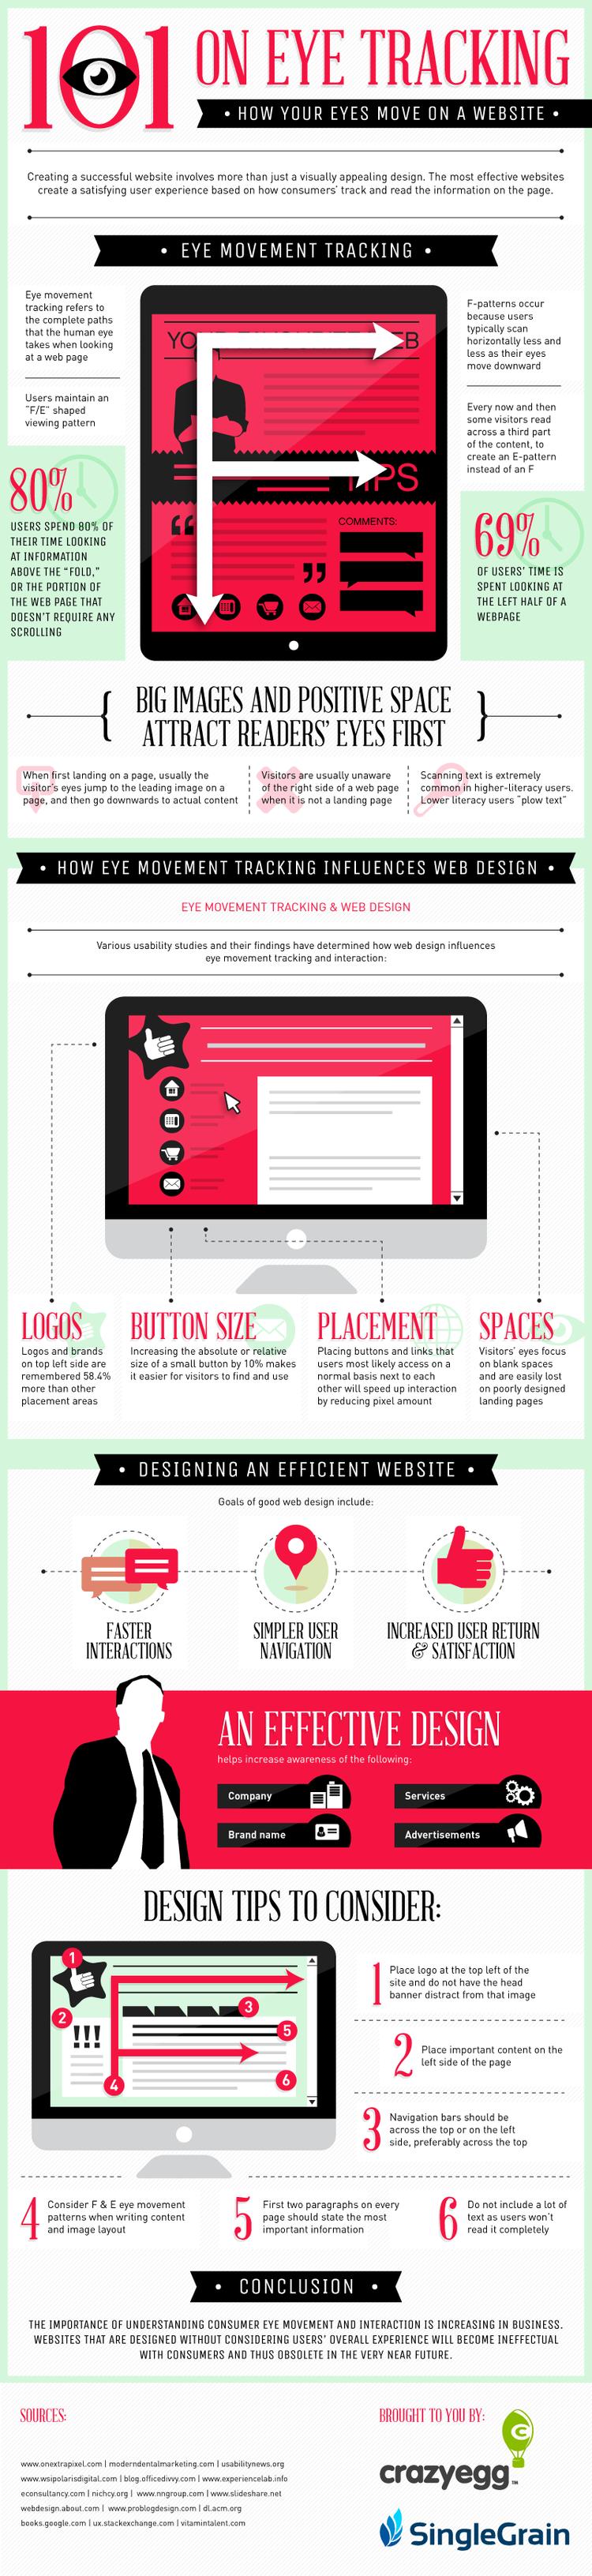 Site-Design-Techniques